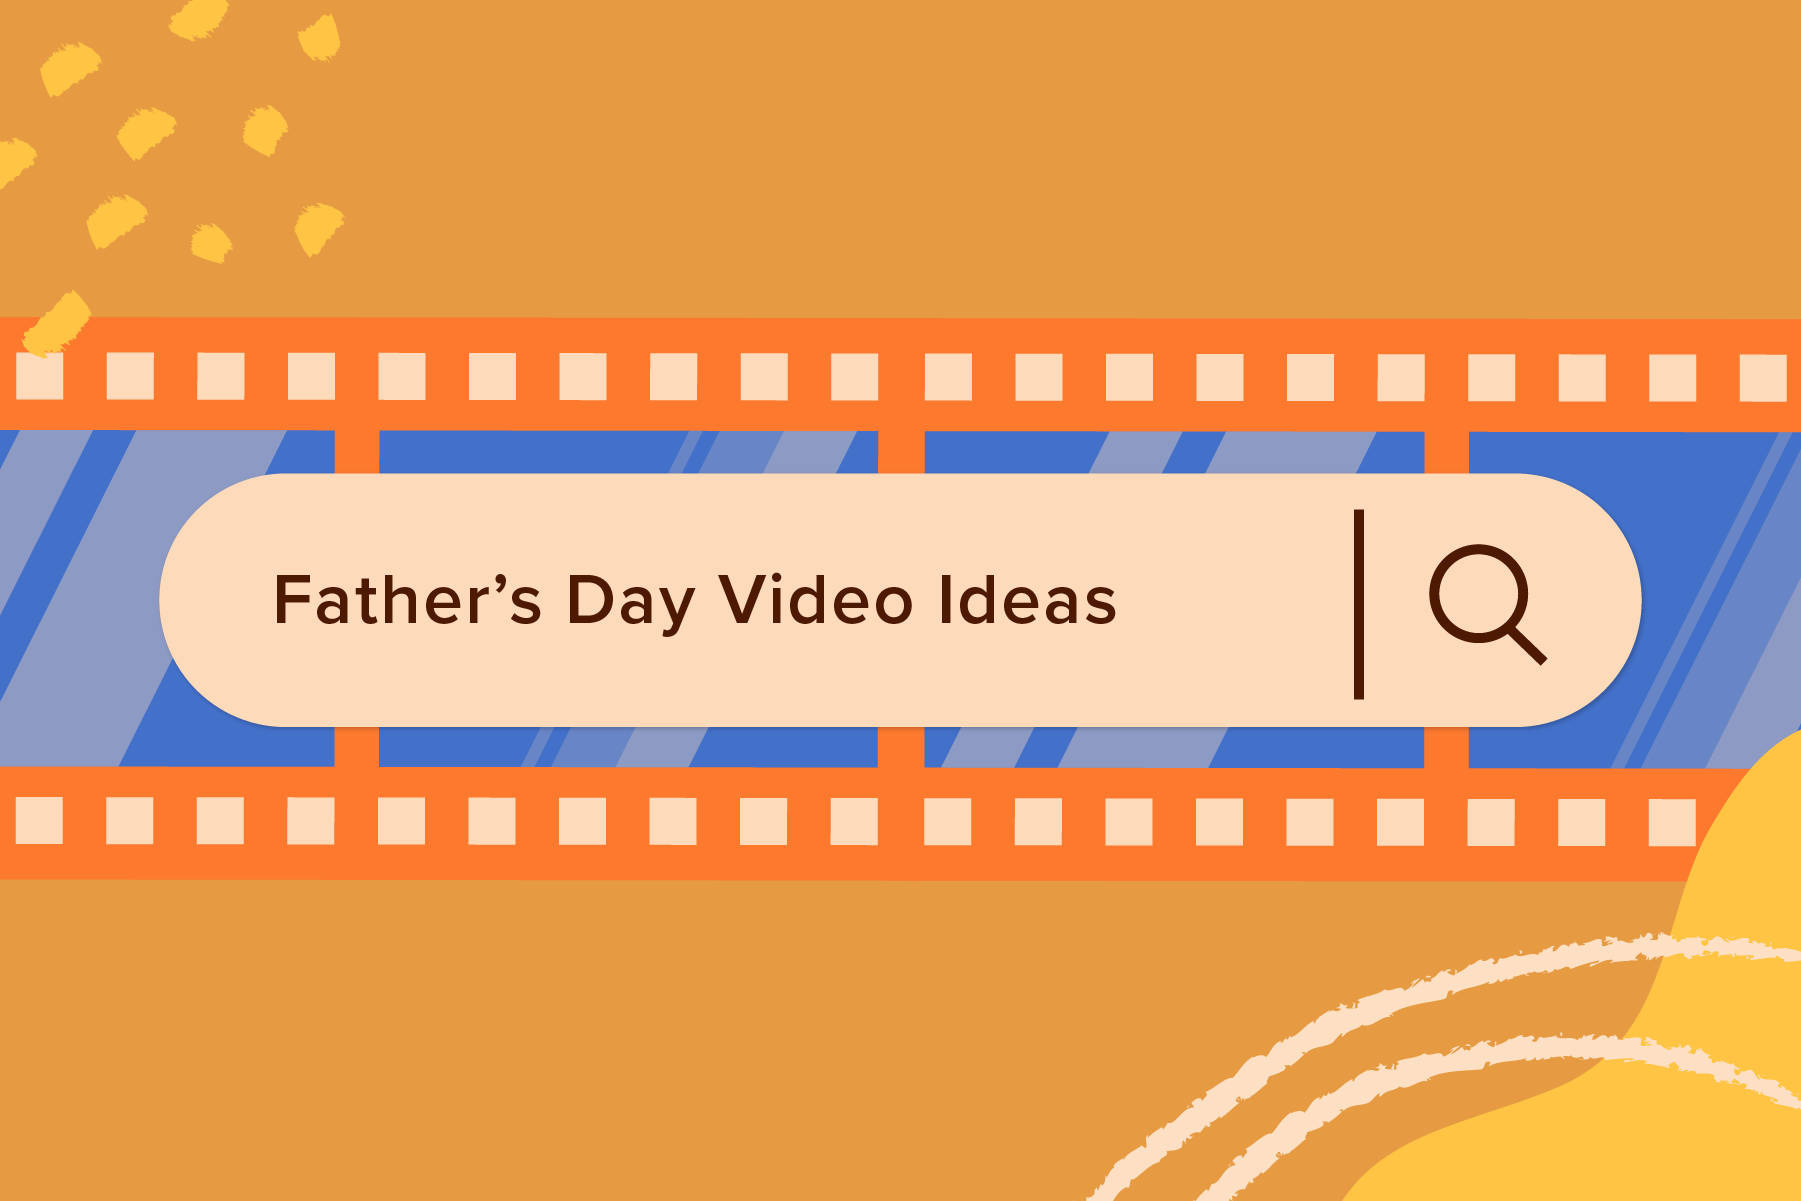 2021-05 Inspiration-5FathersDay-Video-Ideas Blog image